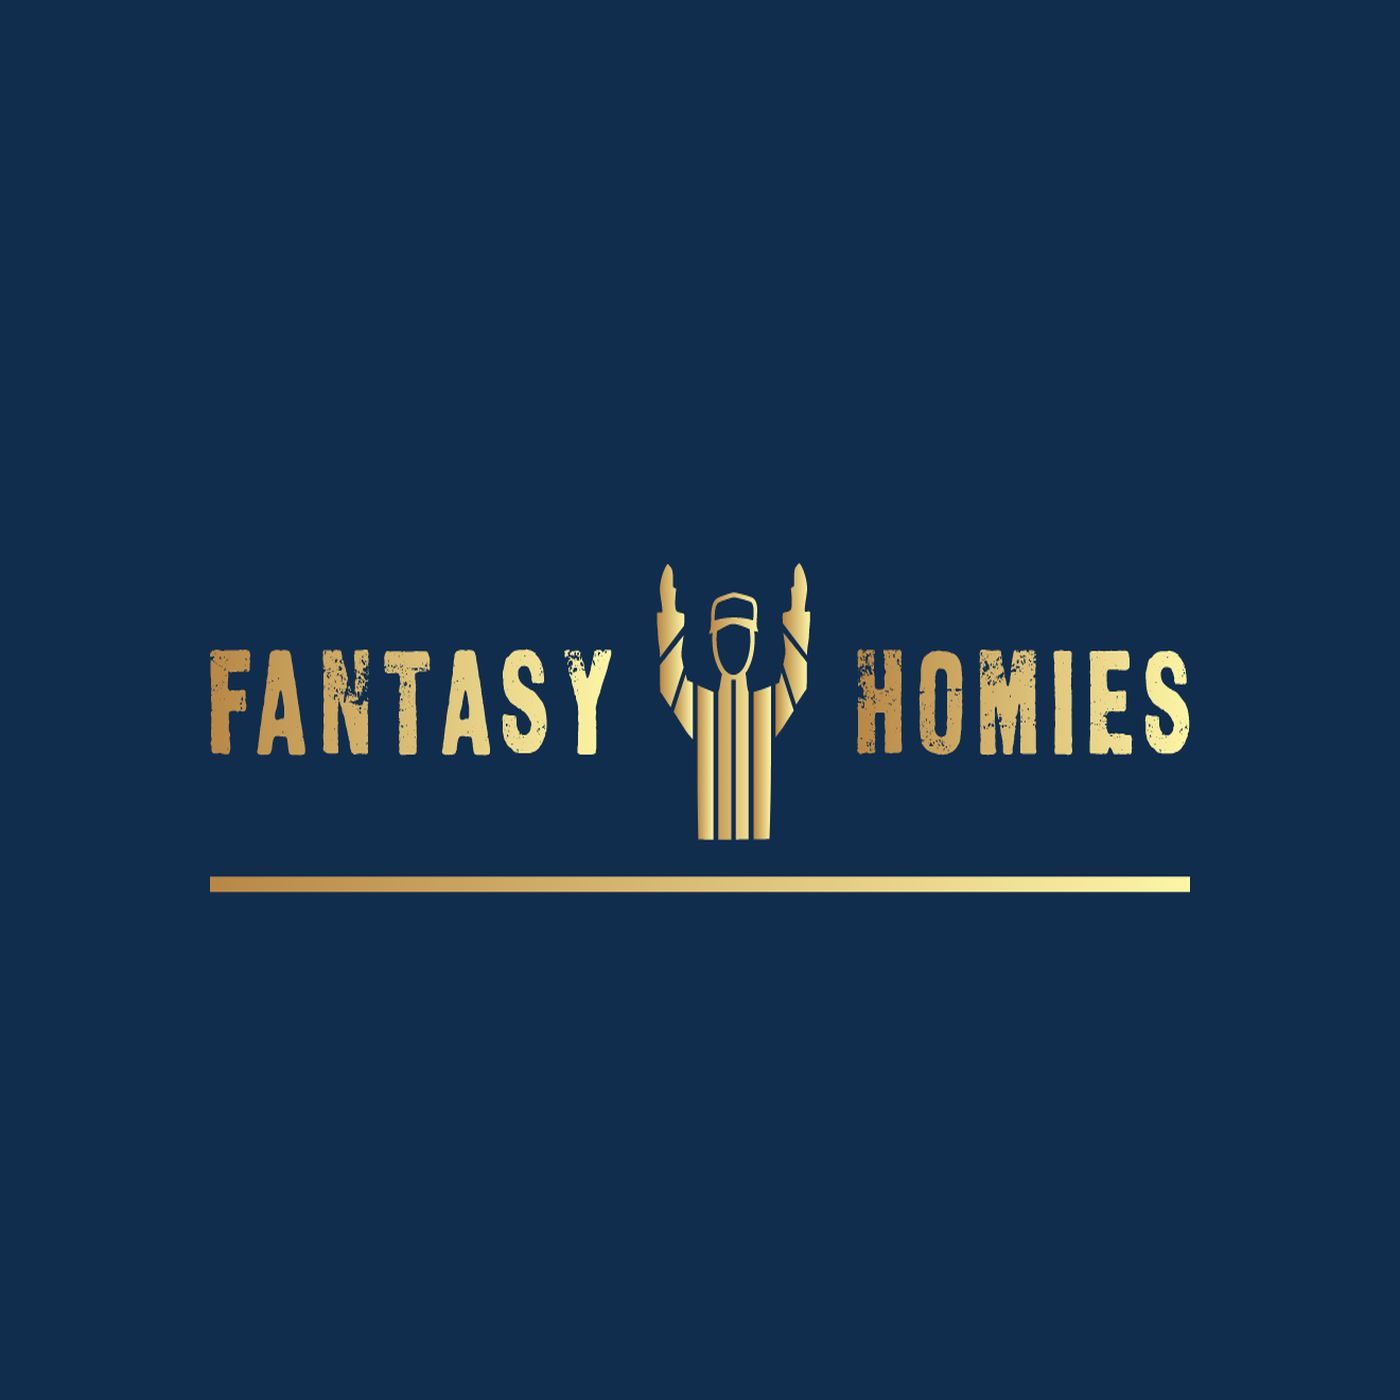 The Fantasy Football Homies